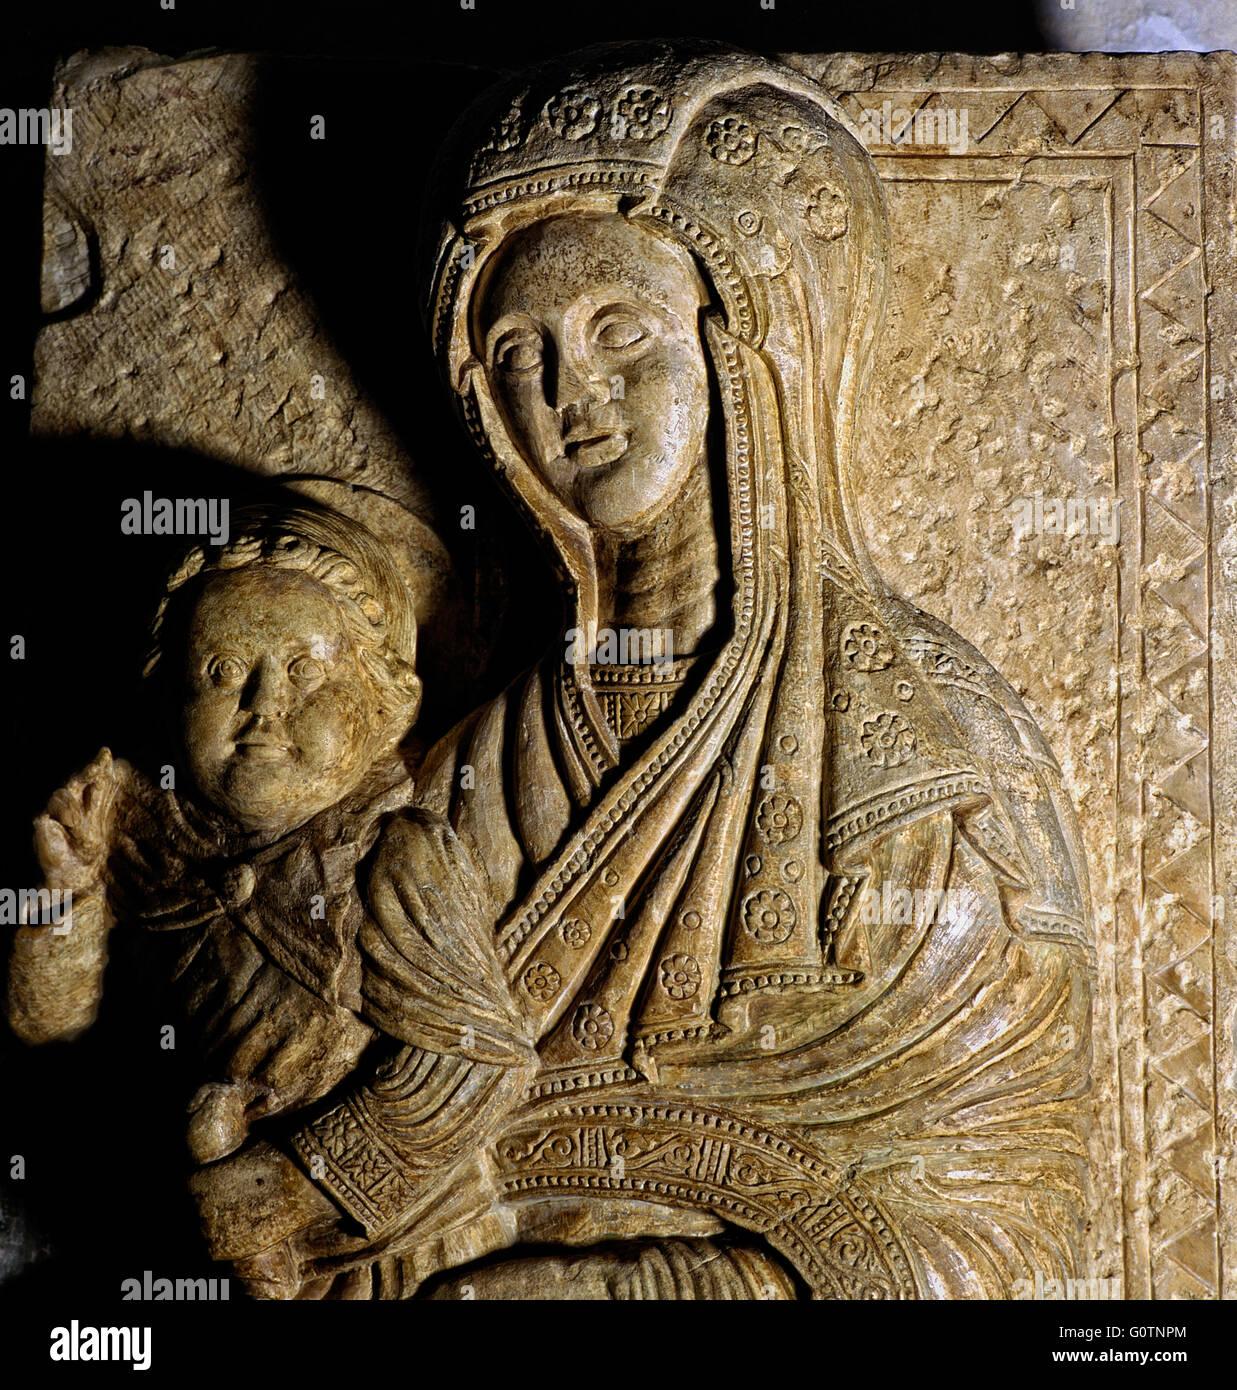 Italy Abruzzo Sulmona Cathedral of St. Panfilo - Madonna delle Fornaci  X - XI century - Stock Image